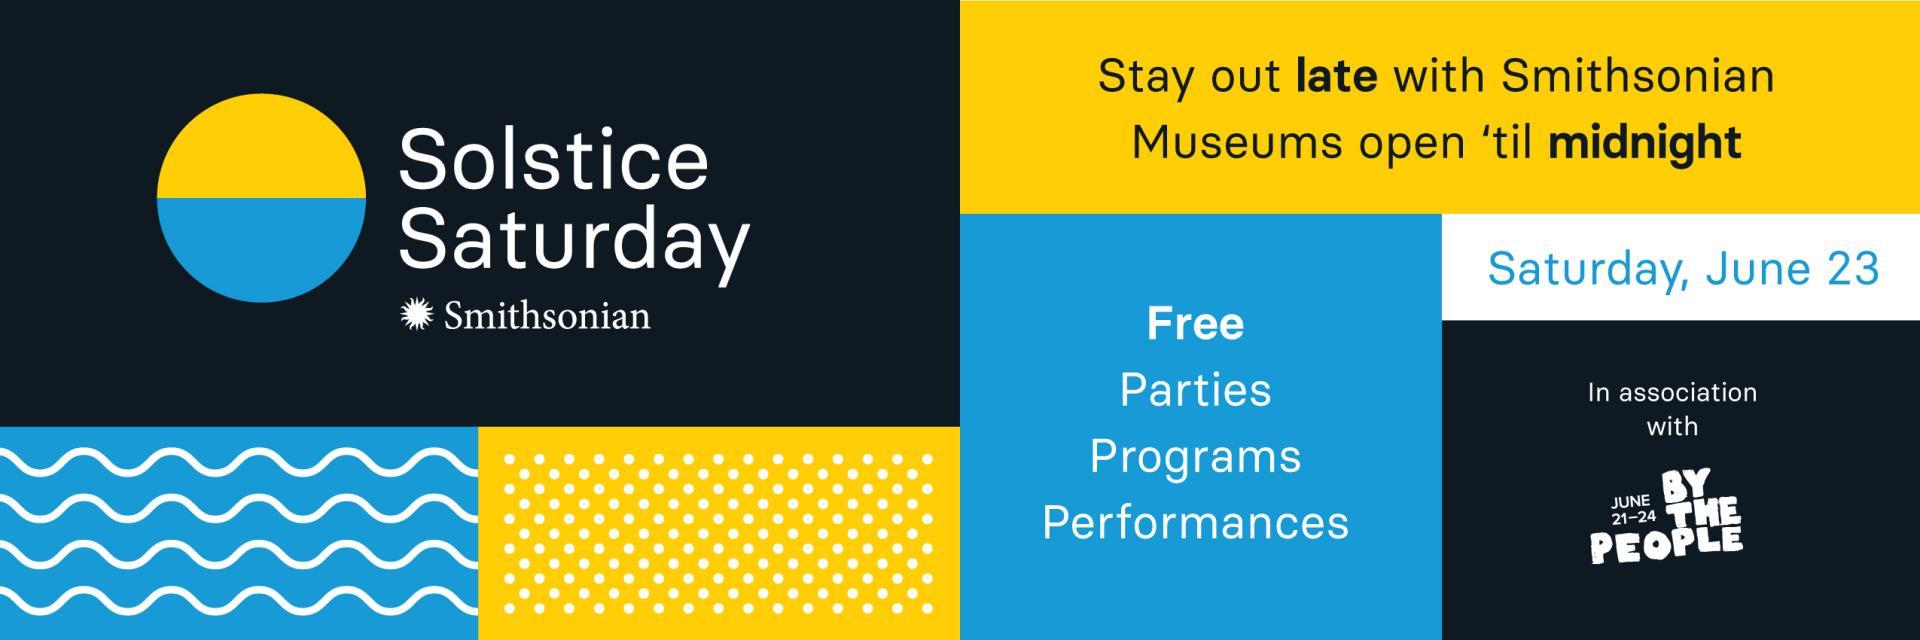 Smithsonian Solstice Saturday